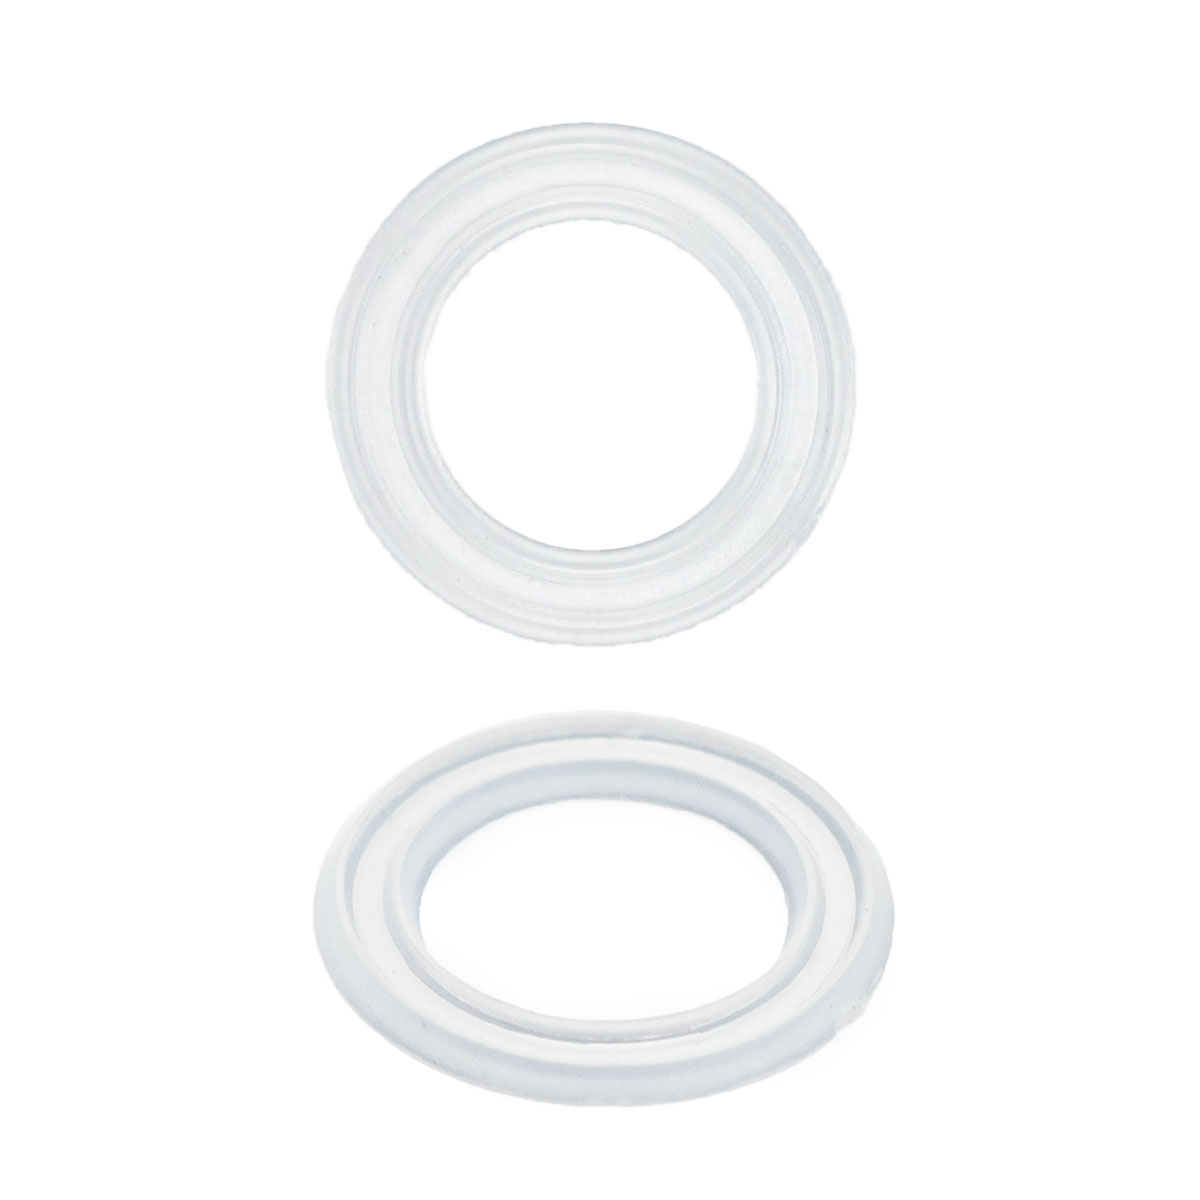 64778 Кольцо пласт. под люверс, д-8мм прозр. ГР